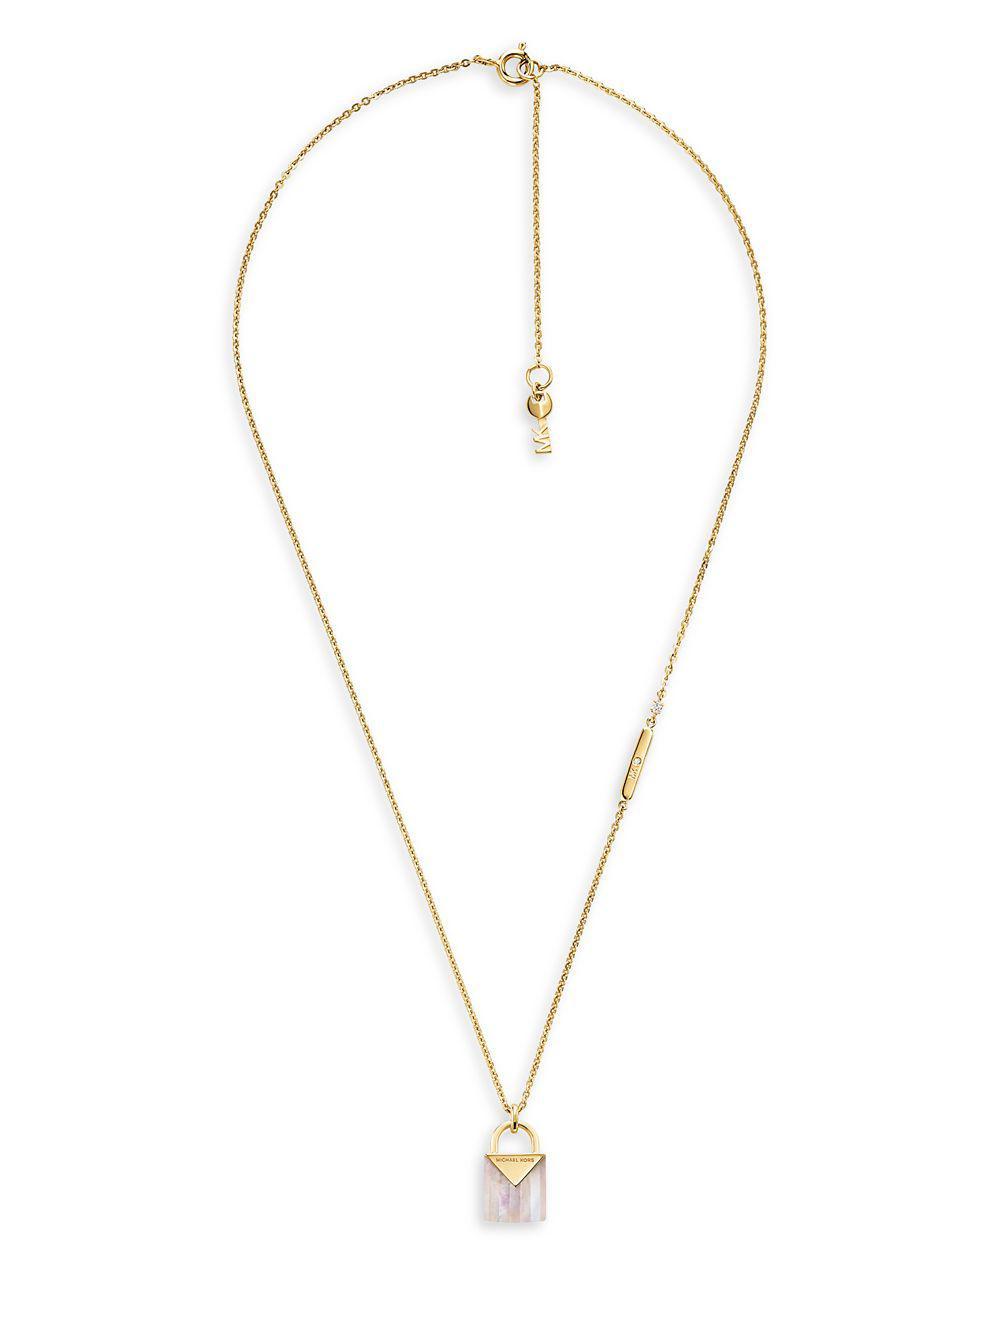 172ac62c49c3b Lyst - Michael Kors Kors Color Mercer Mother Of Pearl Padlock Pendant  Necklace in Metallic